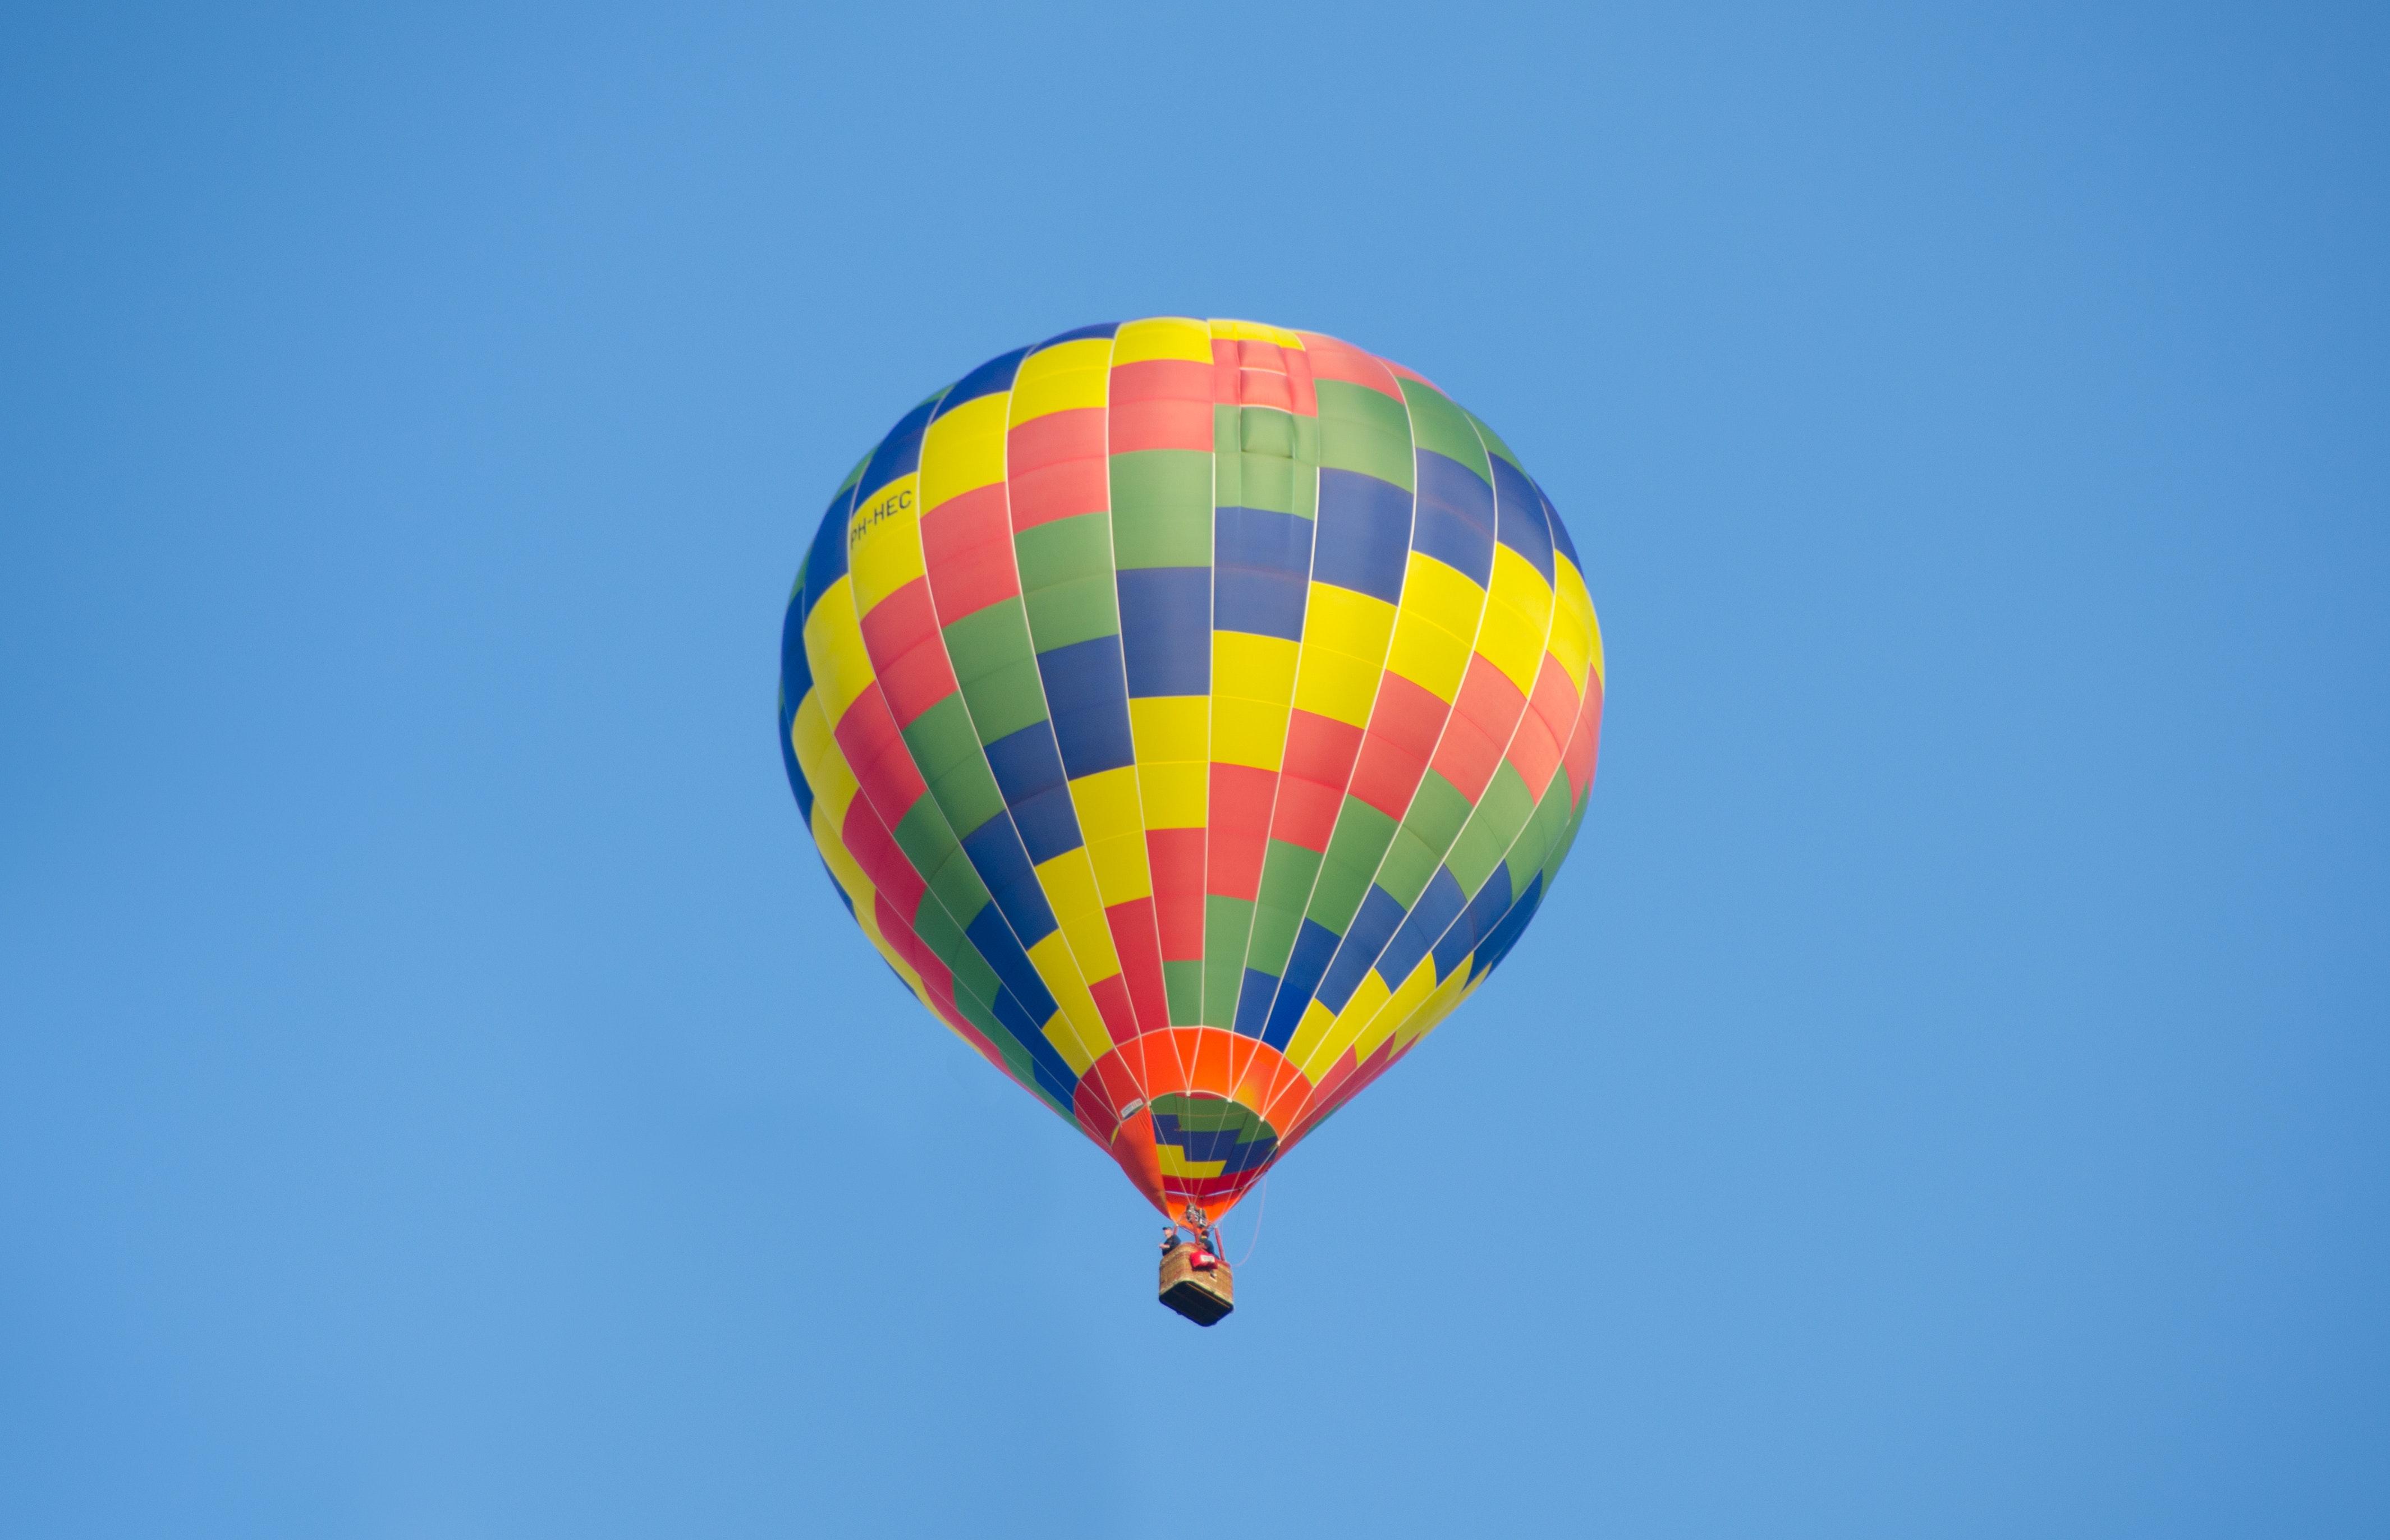 Hot Air Balloon Photo Free Stock Photo